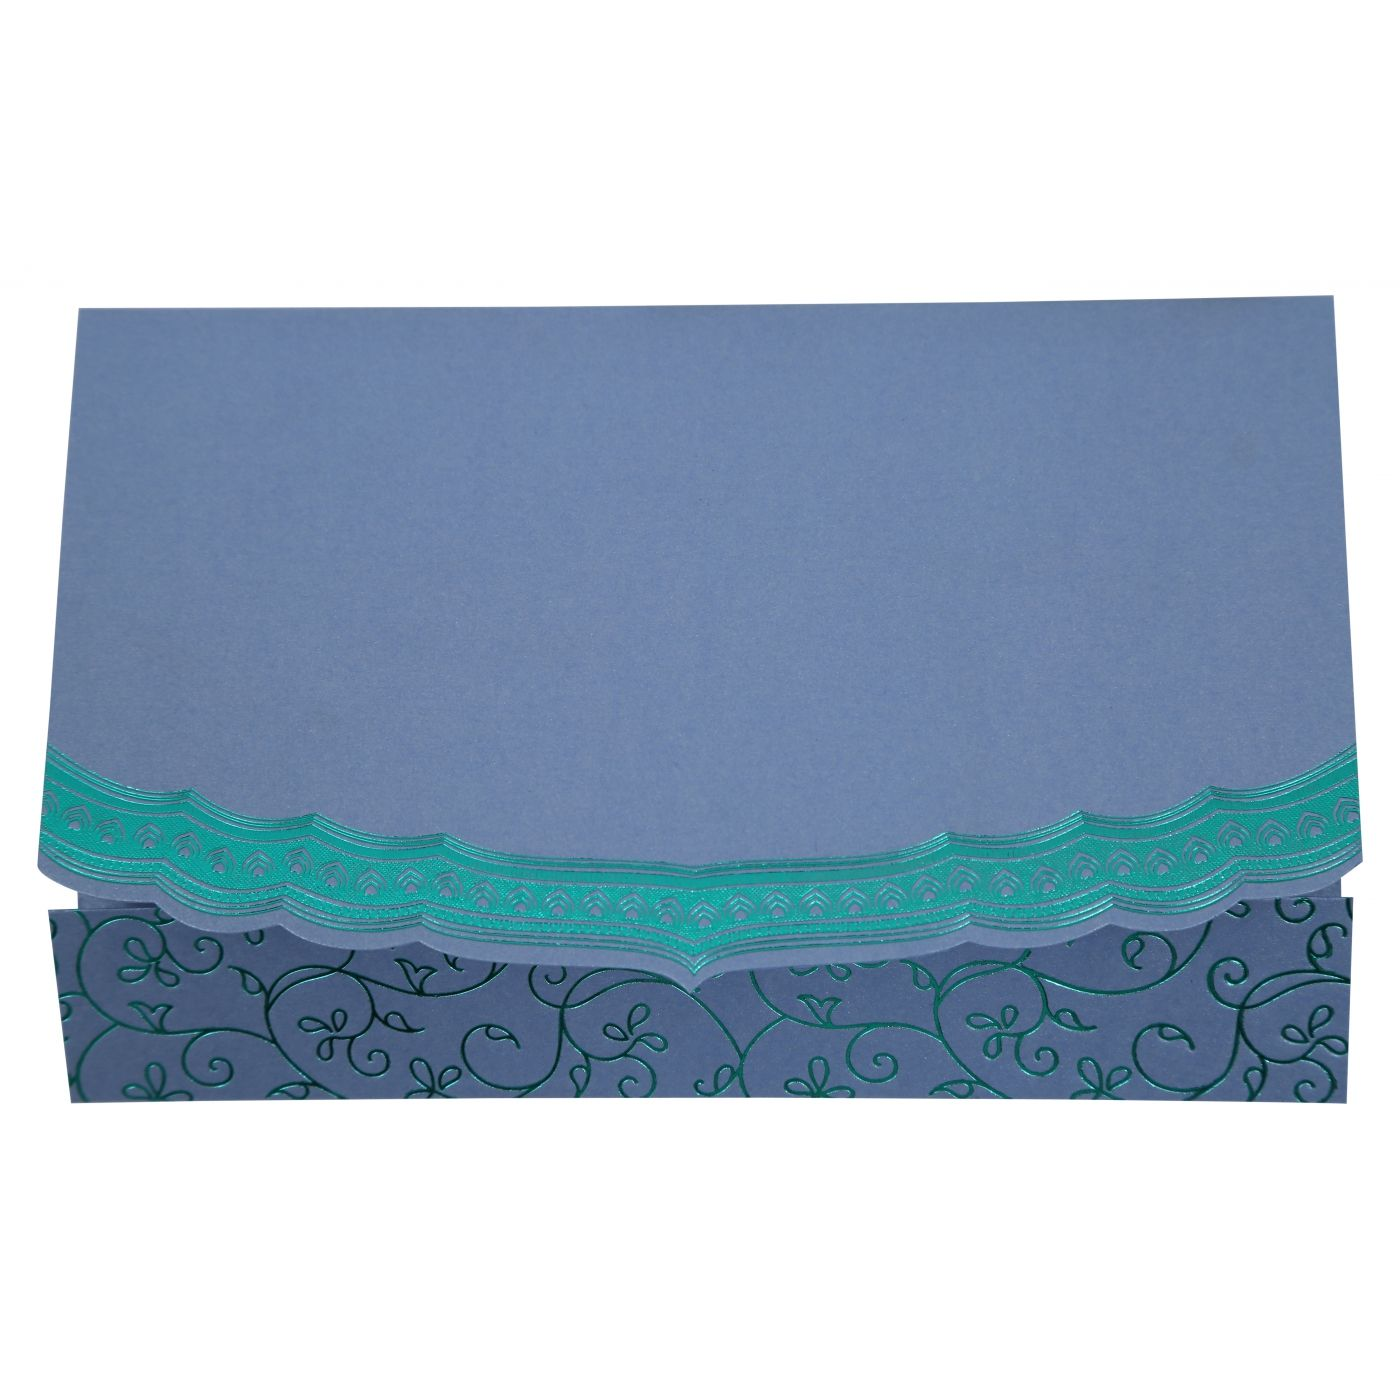 SKY BLUE SHIMMERY FOIL STAMPED WEDDING INVITATION : CRU-806D - IndianWeddingCards